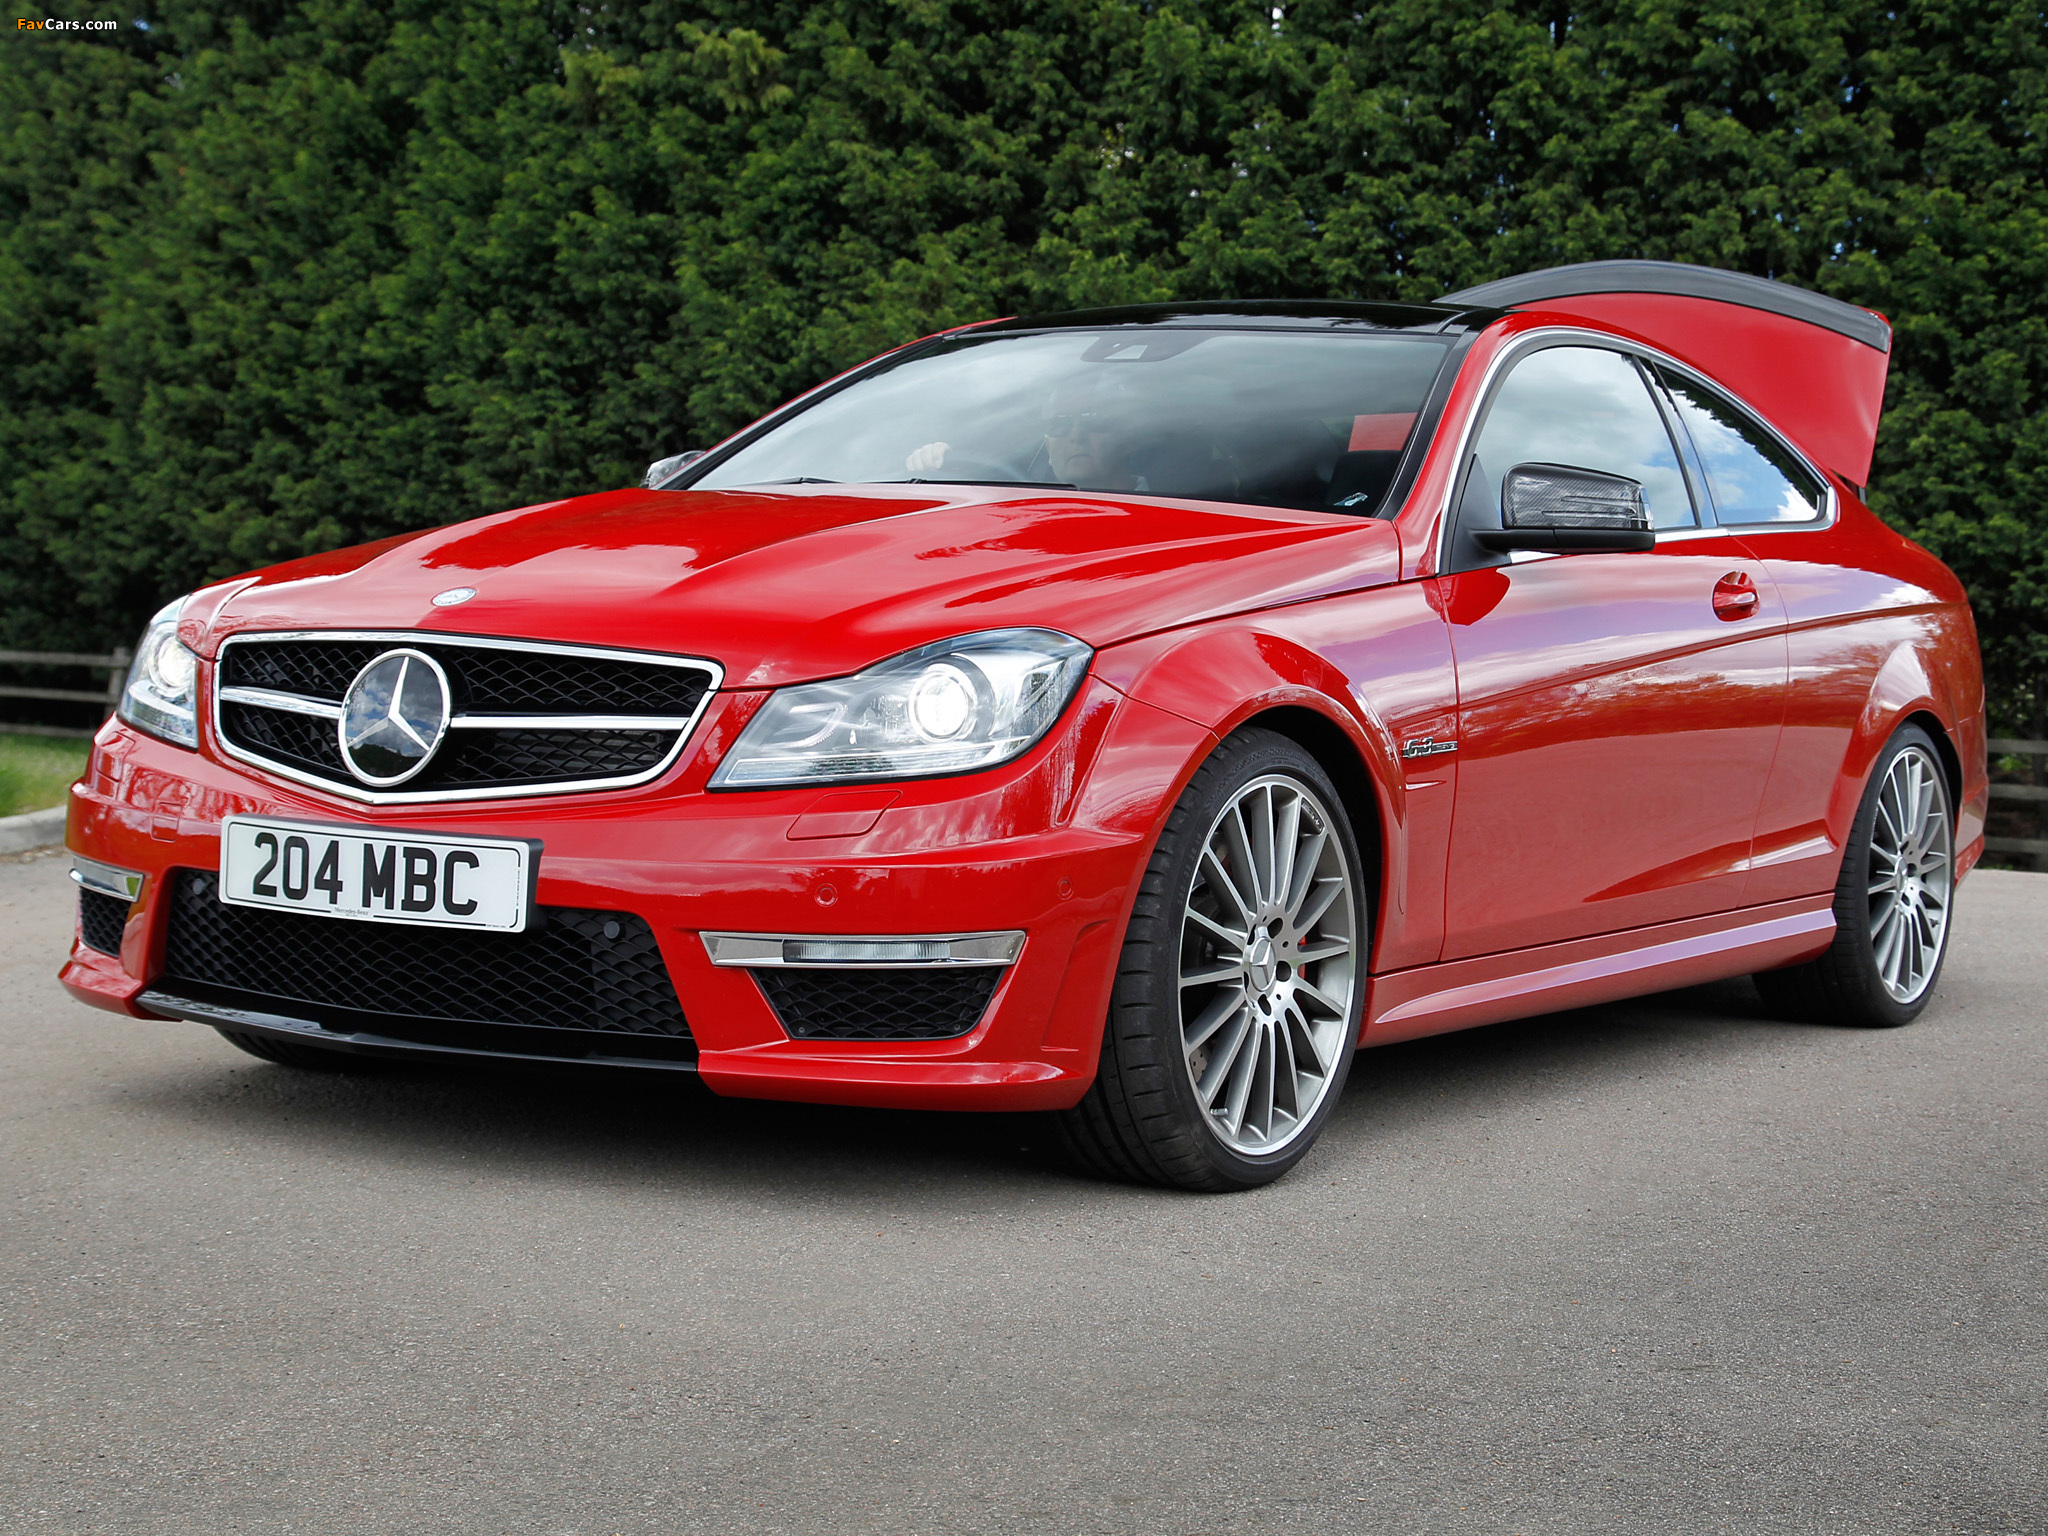 Mercedes-Benz C 63 AMG Coupe UK-spec (C204) 2011 photos (2048 x 1536)